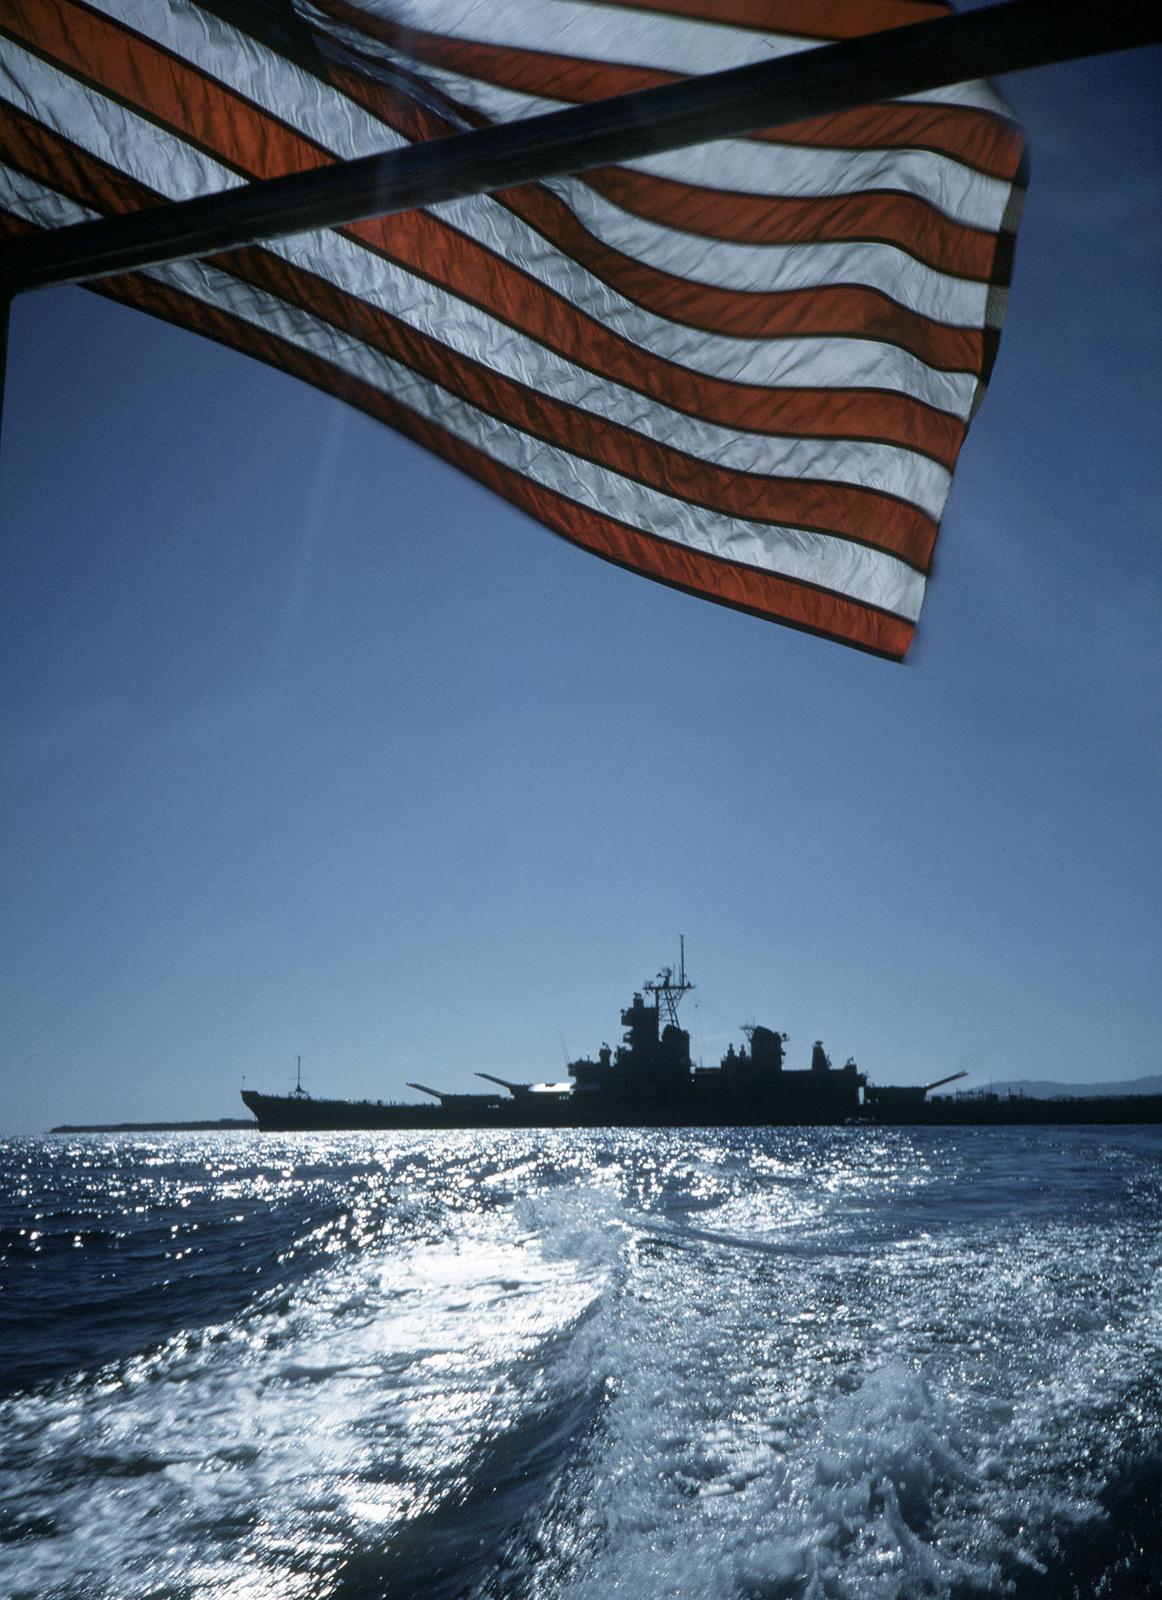 As seen from a departing liberty boat, the battleship USS WISCONSIN (BB-64) lies at anchor near U.S. Naval Station, Guantanamo Bay, Cuba